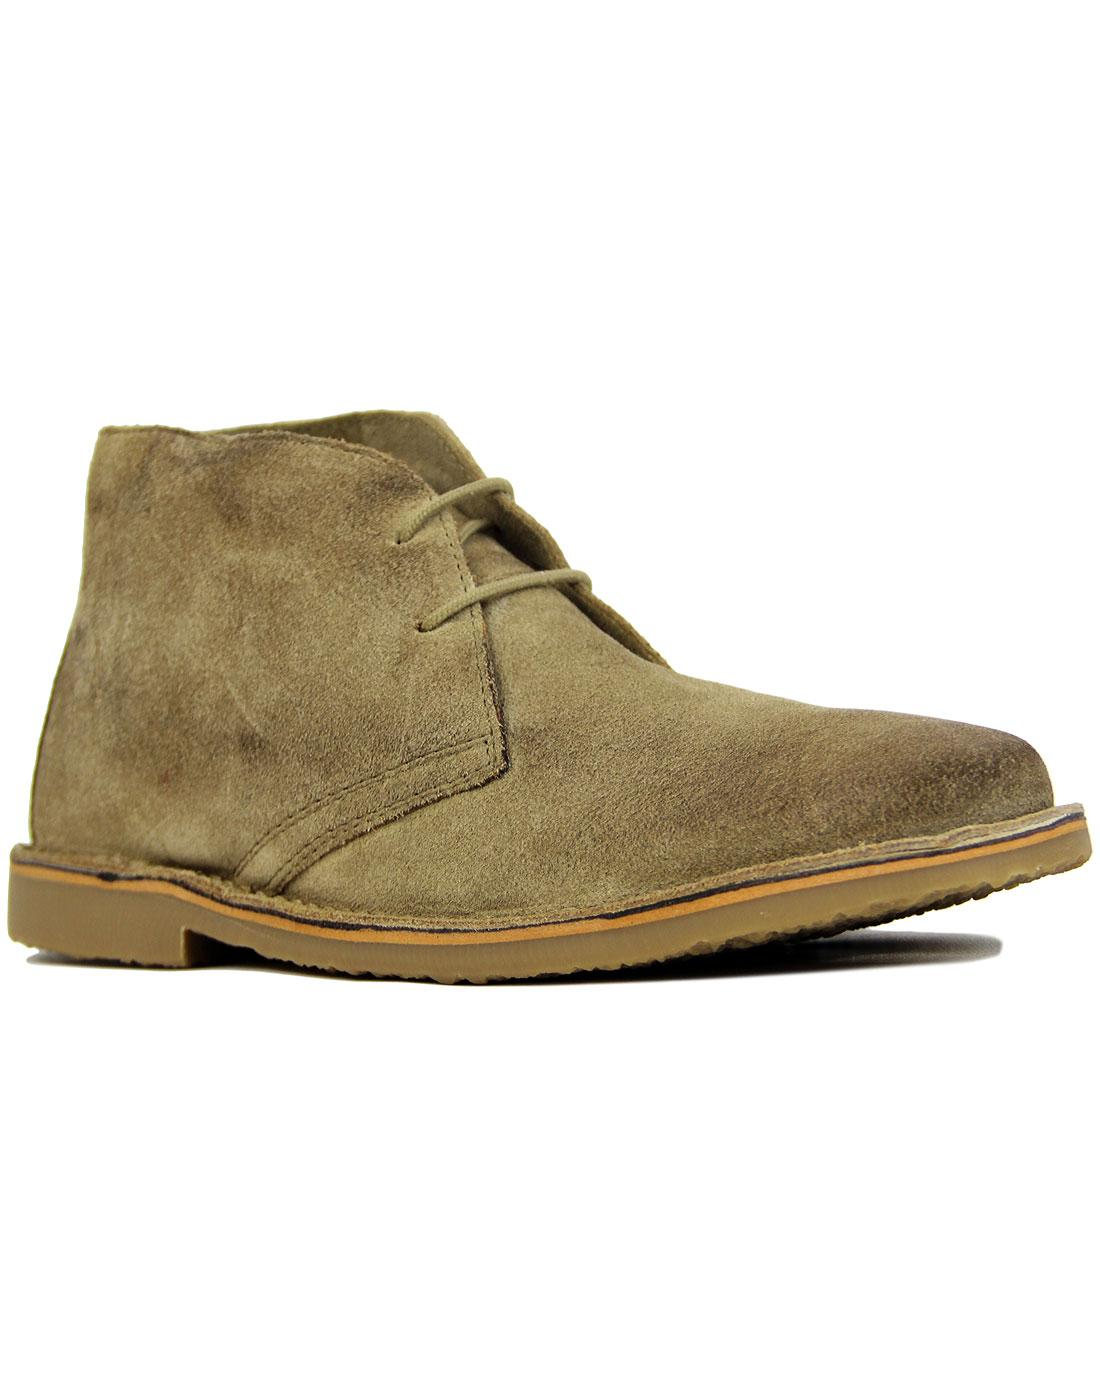 Canyon IKON ORIGINAL 60s Mod Suede Desert Boots T